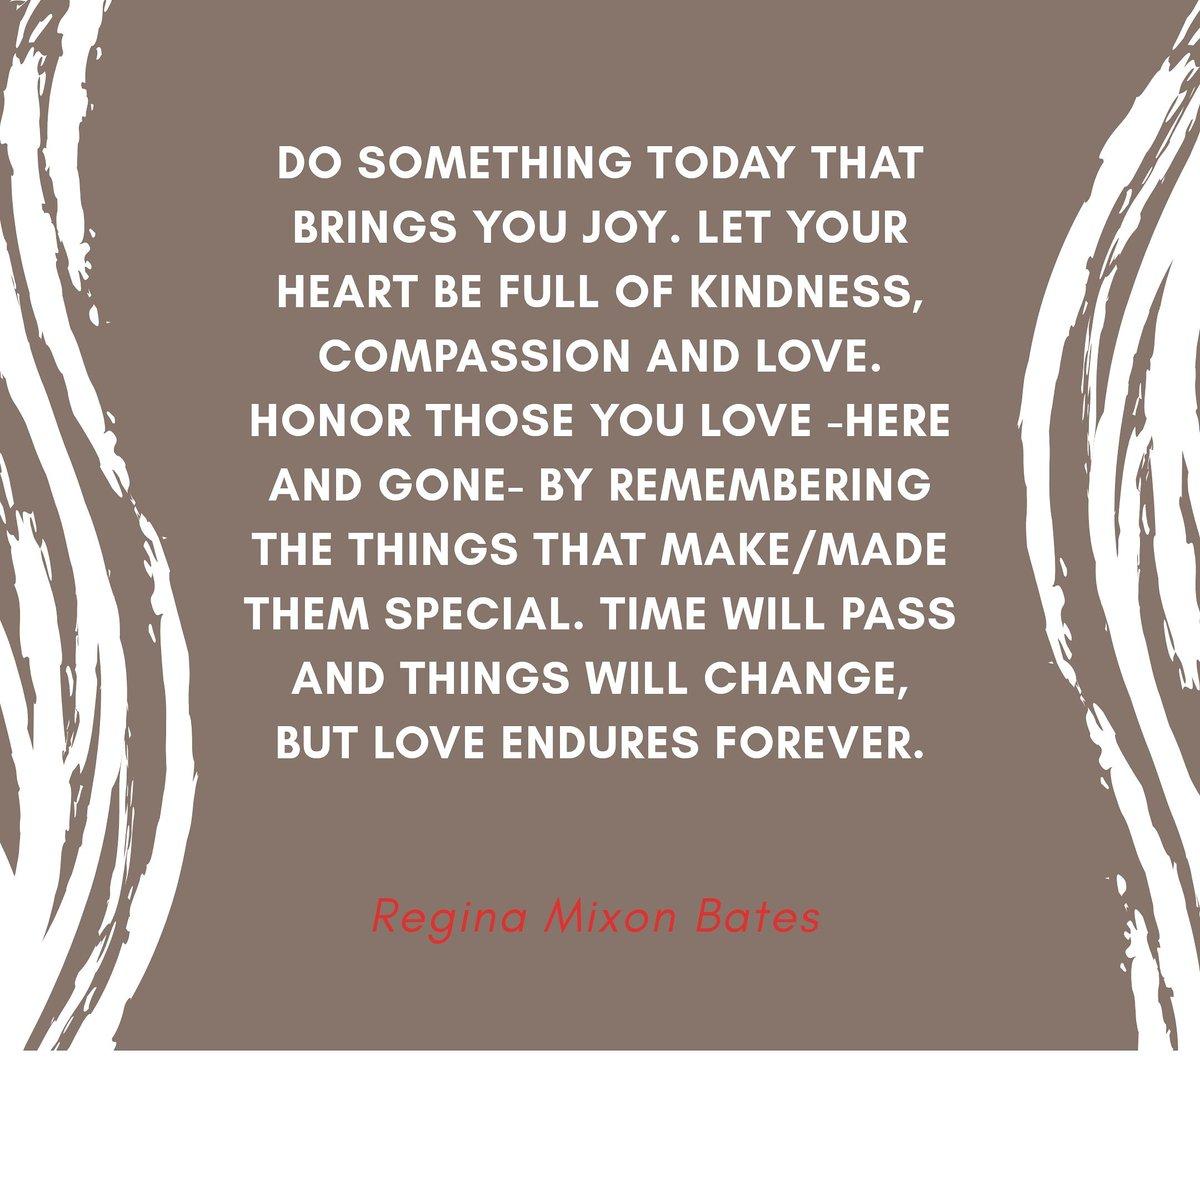 Do something today that brings you joy.  #changeyourmindset #inspiration #wordstoliveby #ownyourfuture #leadership #authorslife #publicspeaker #motivationalspreaker #youcanbeattheodds #ReginaMixonBatespic.twitter.com/InOQbn2mur